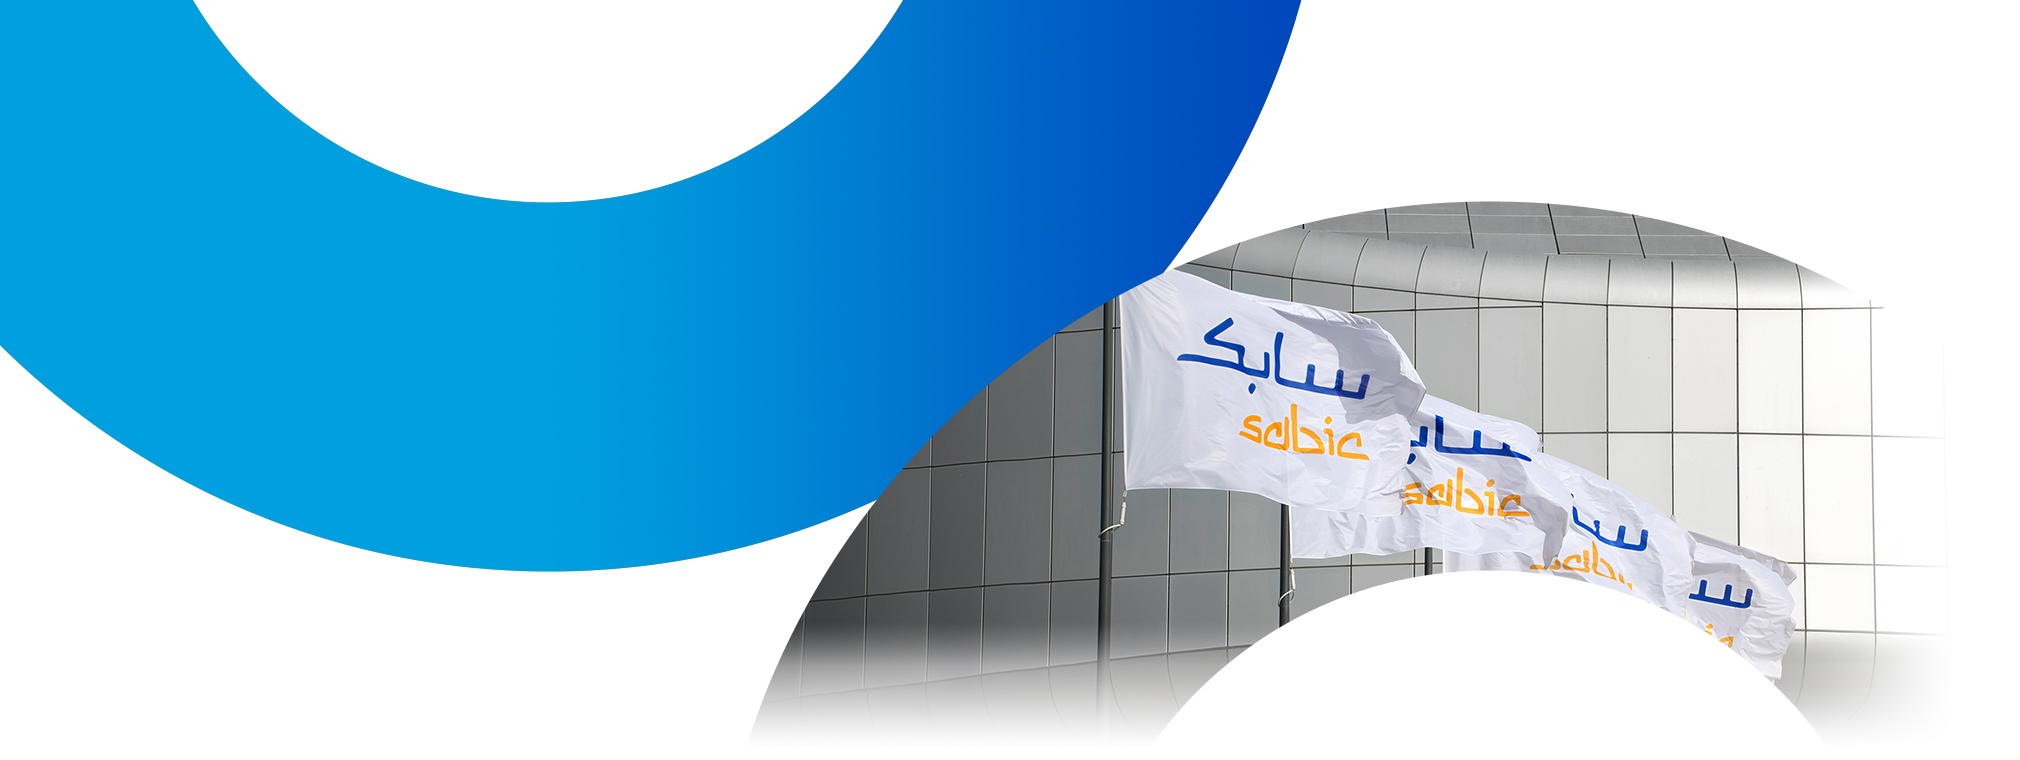 SABIC - SABIC homepage